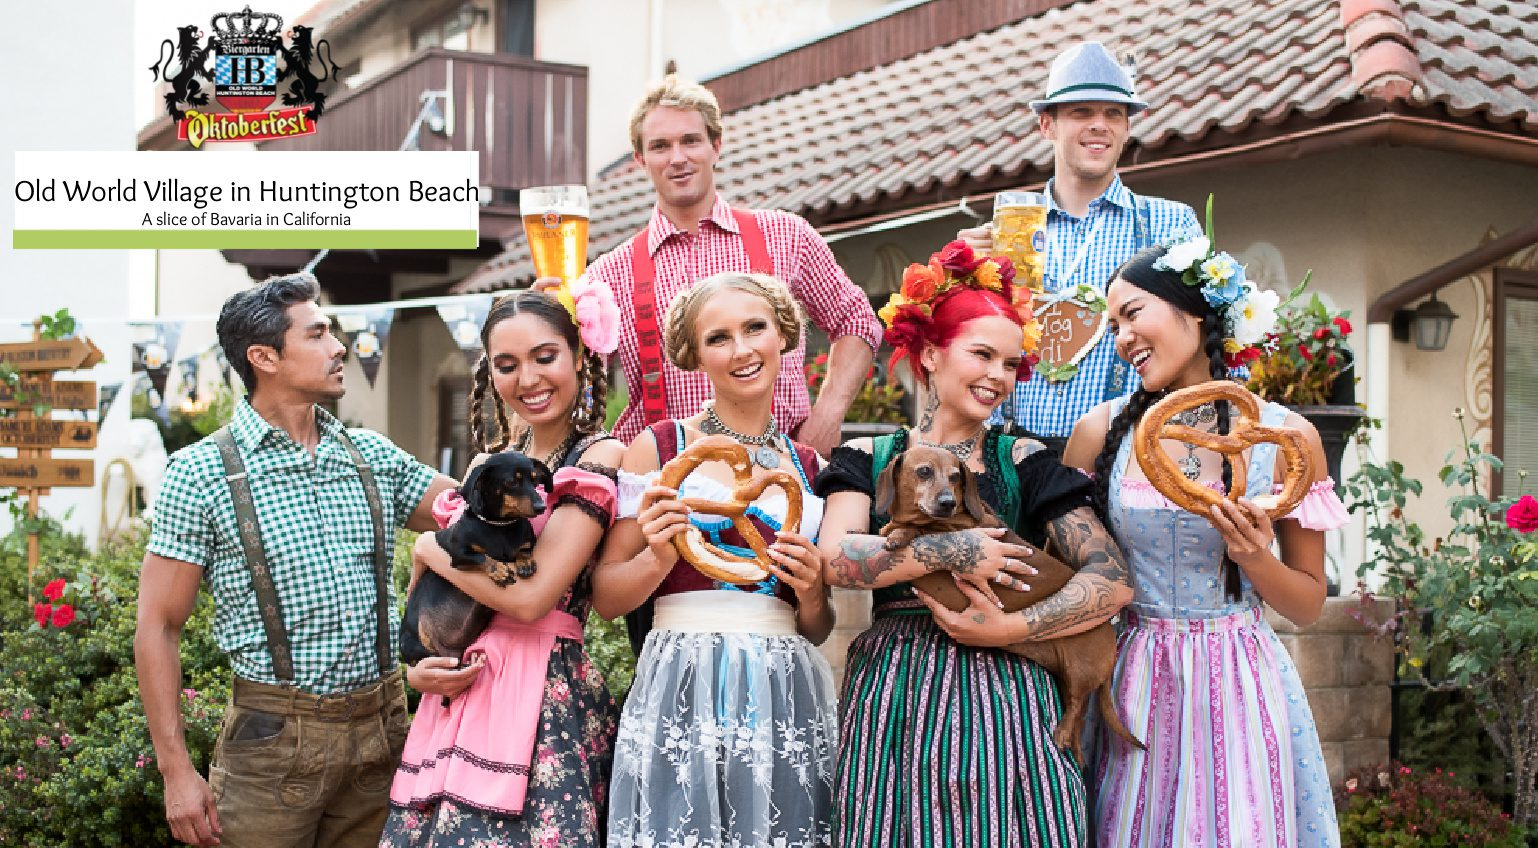 Old World Village in Huntington Beach- A slice of Bavaria in California